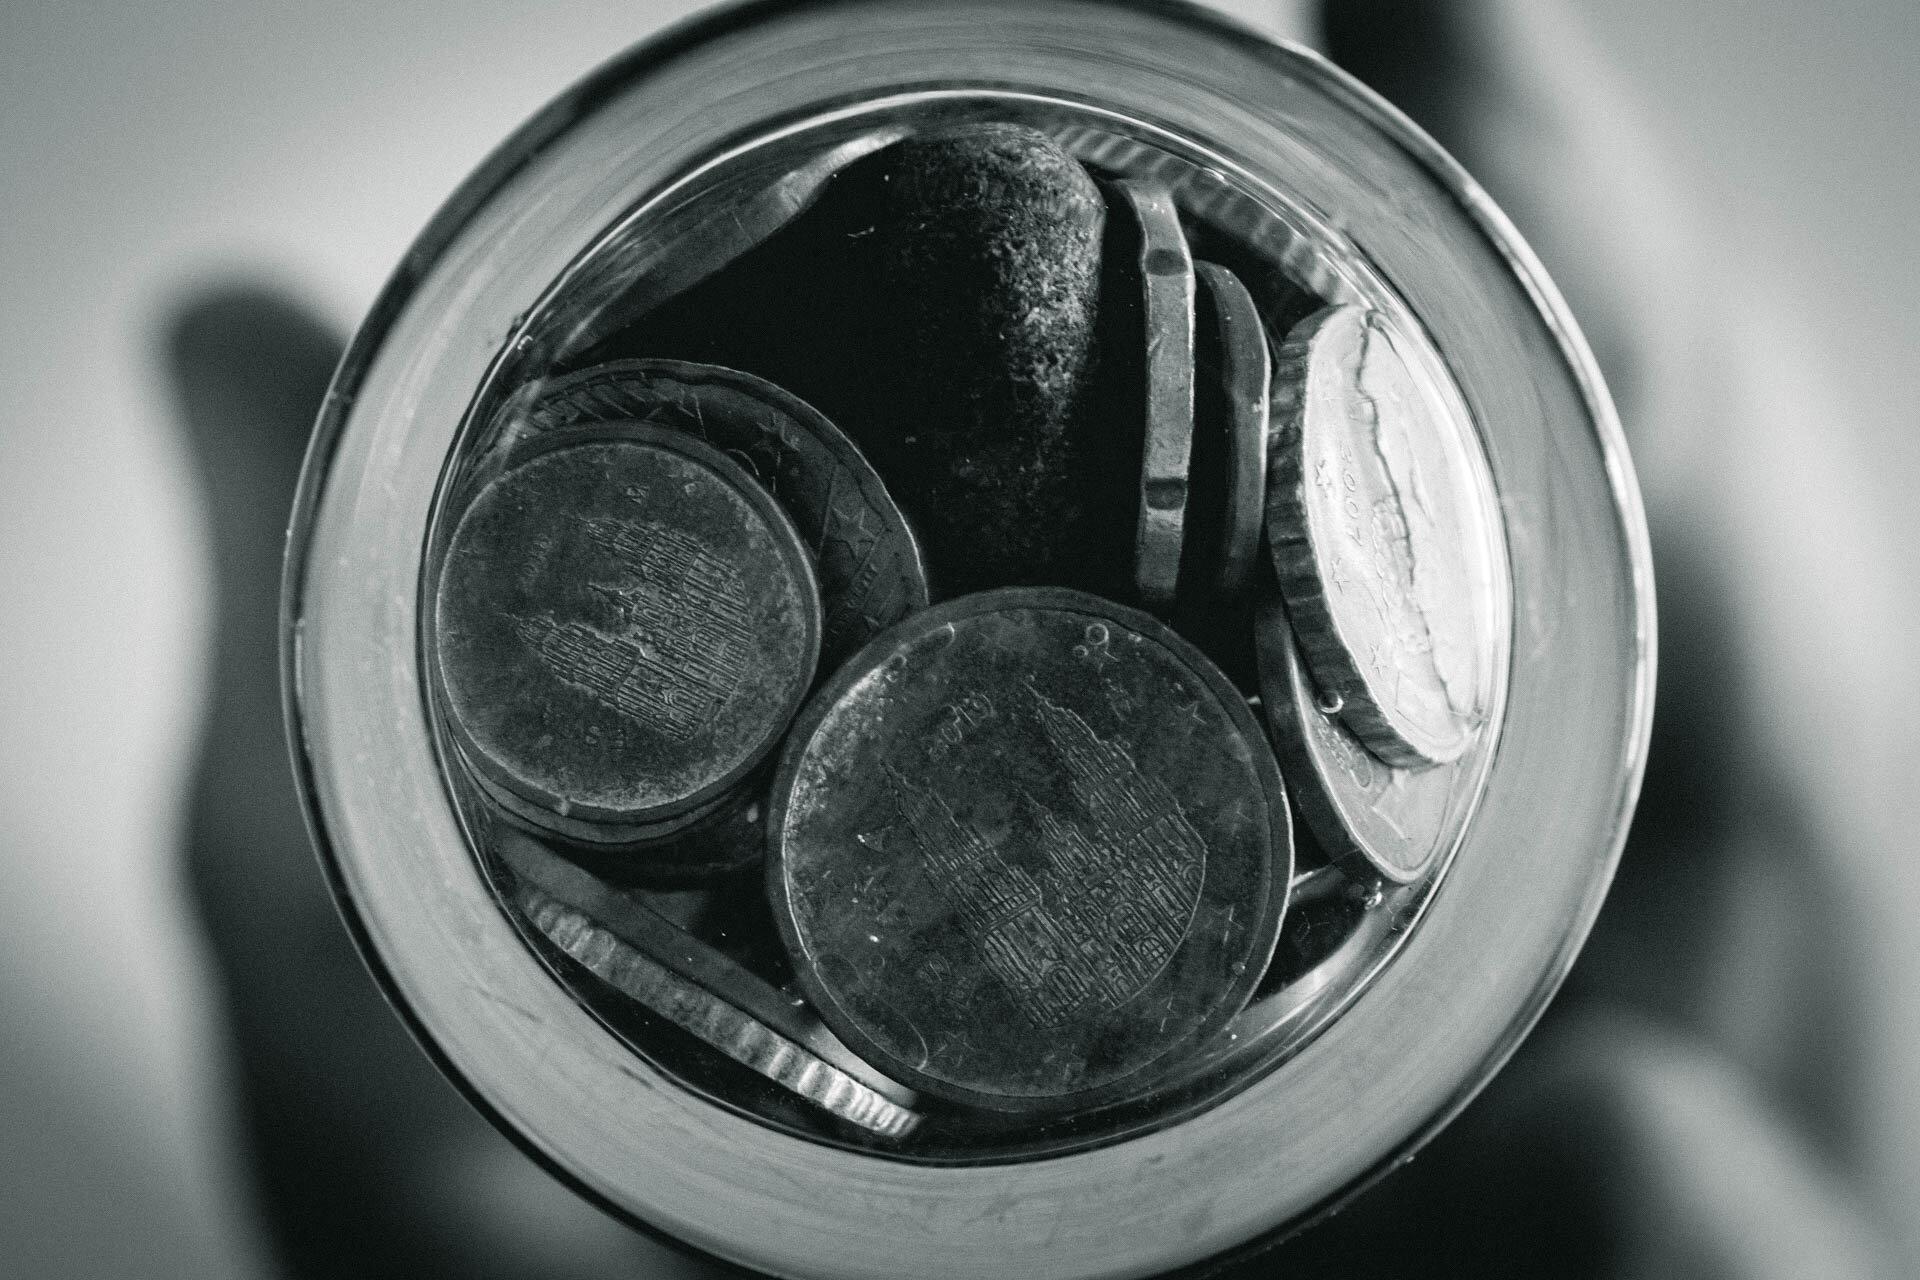 BPP 12 - Coins - IG-5.jpg